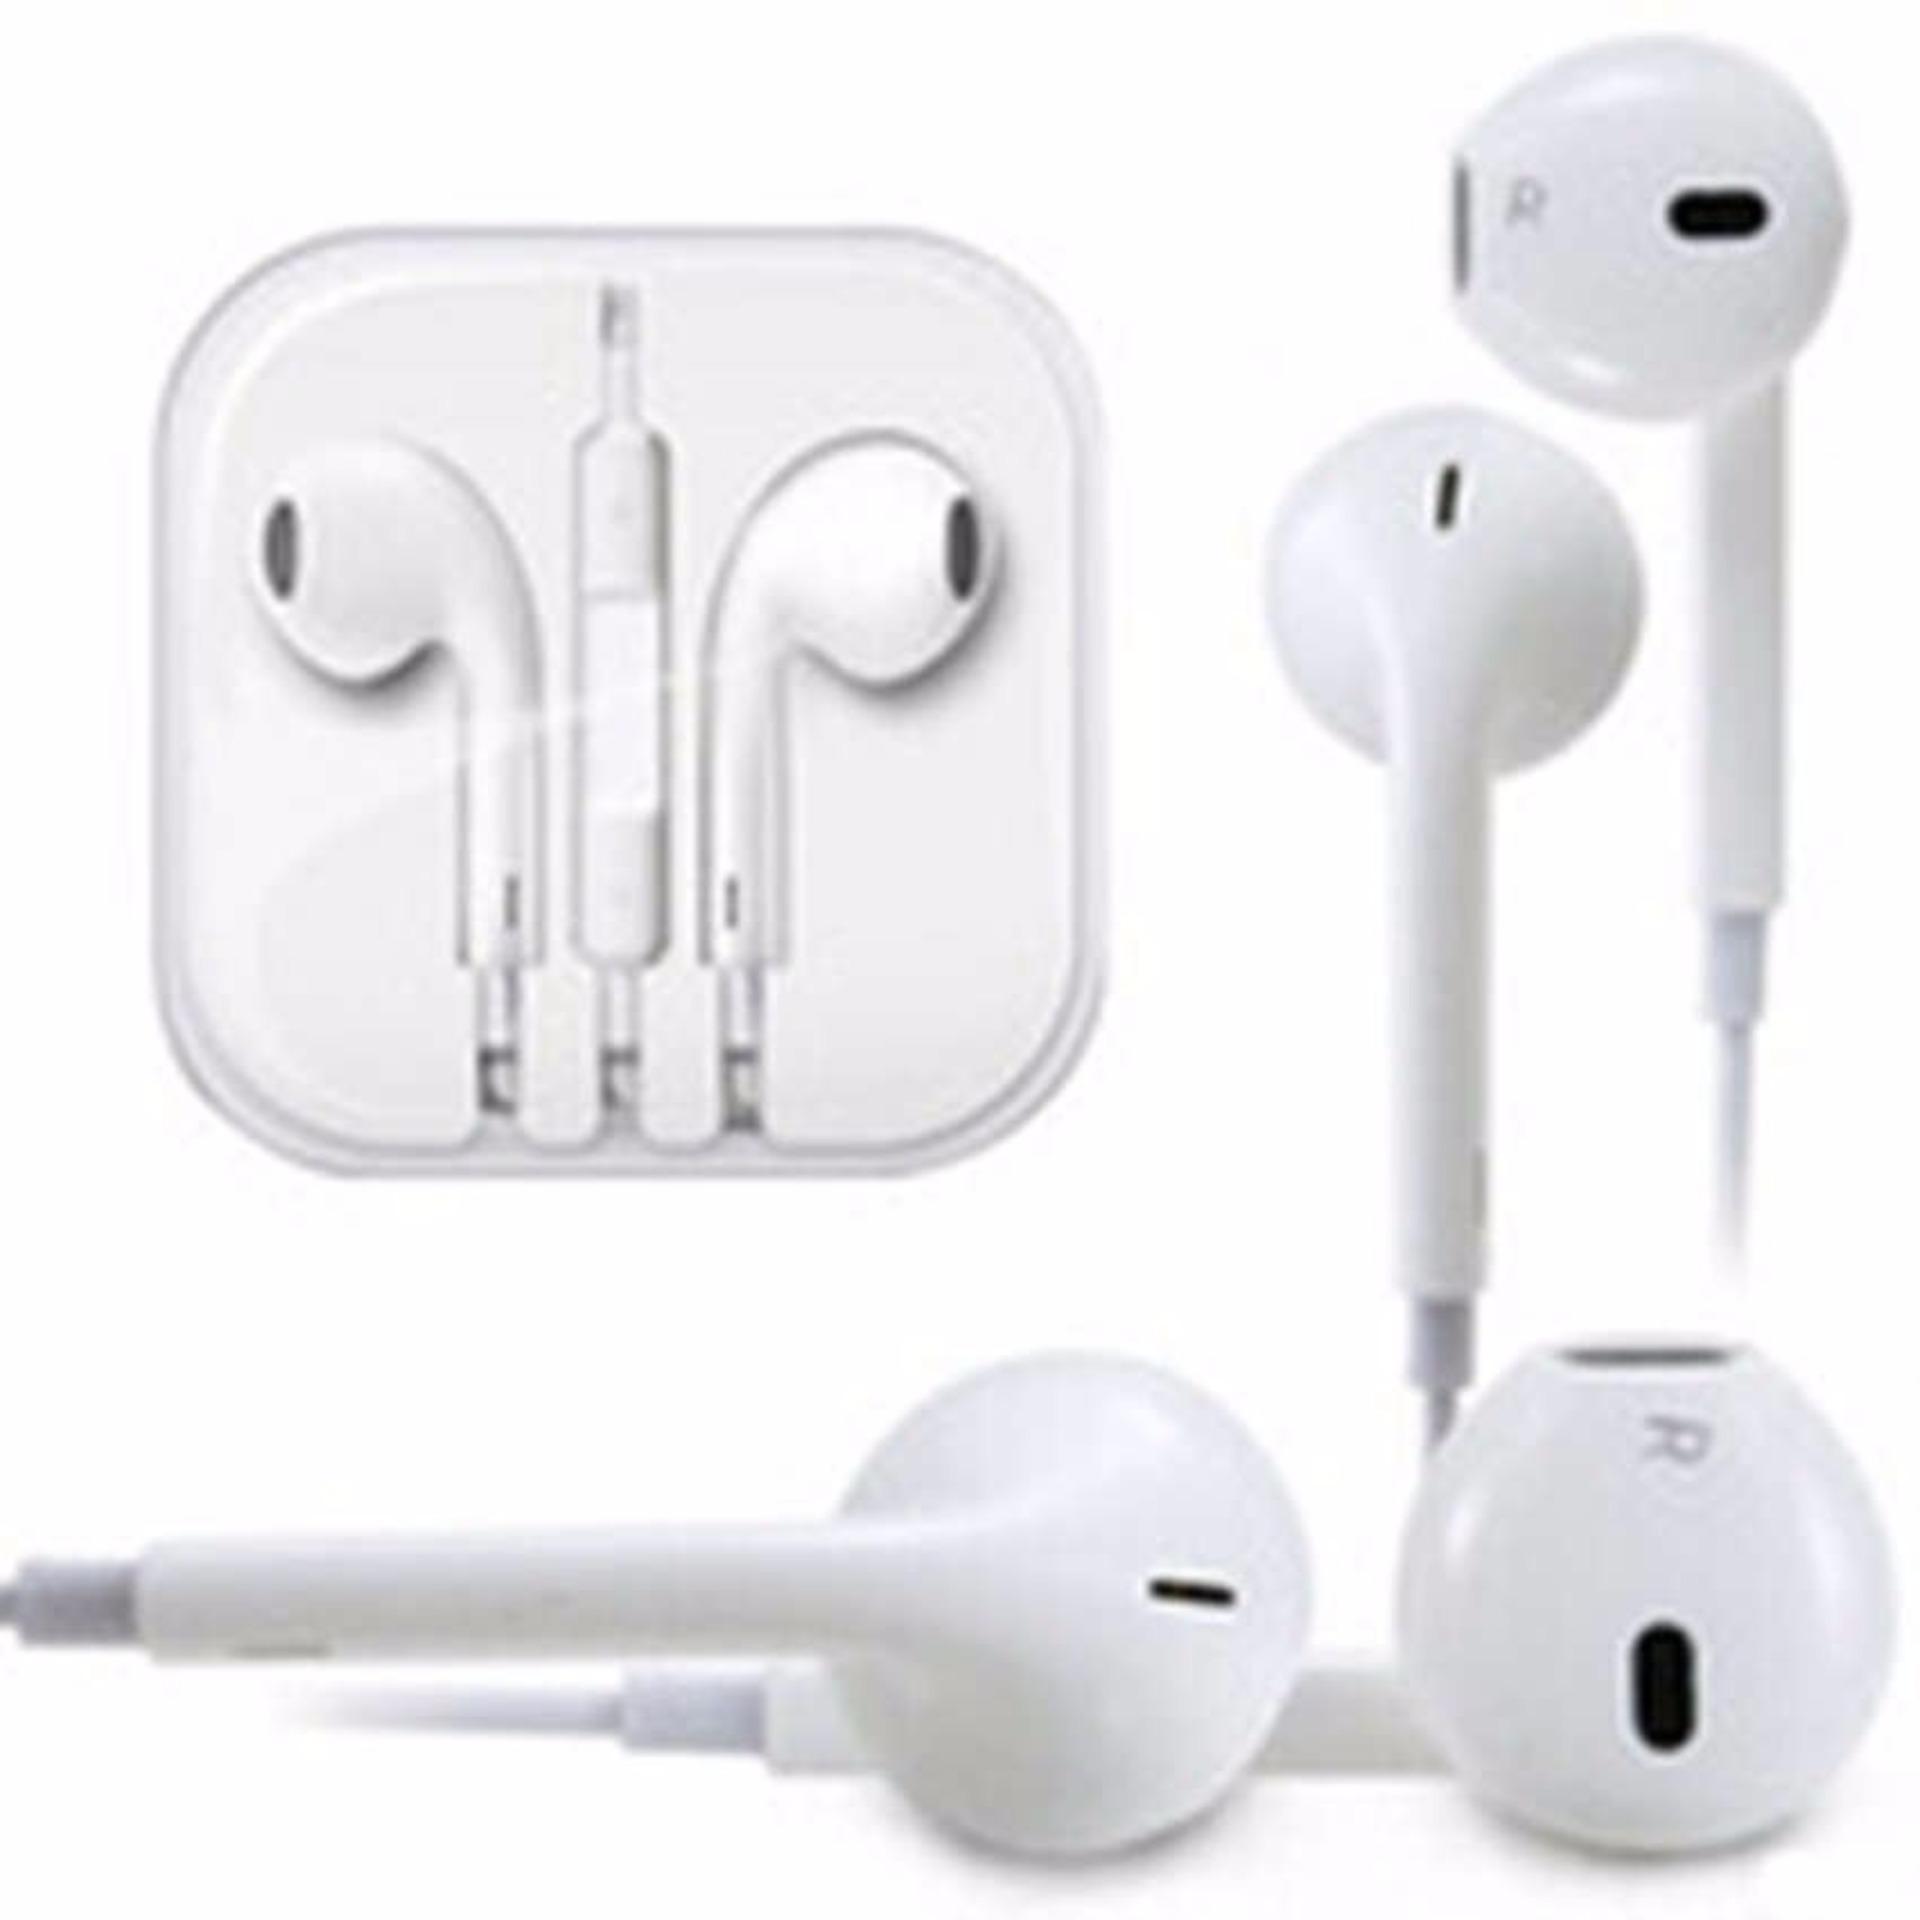 Apple Handsfree For Iphone 5 5c 5s Headset Earphone Vivan Resong W3 Warna Putih Hf Earpod Oem